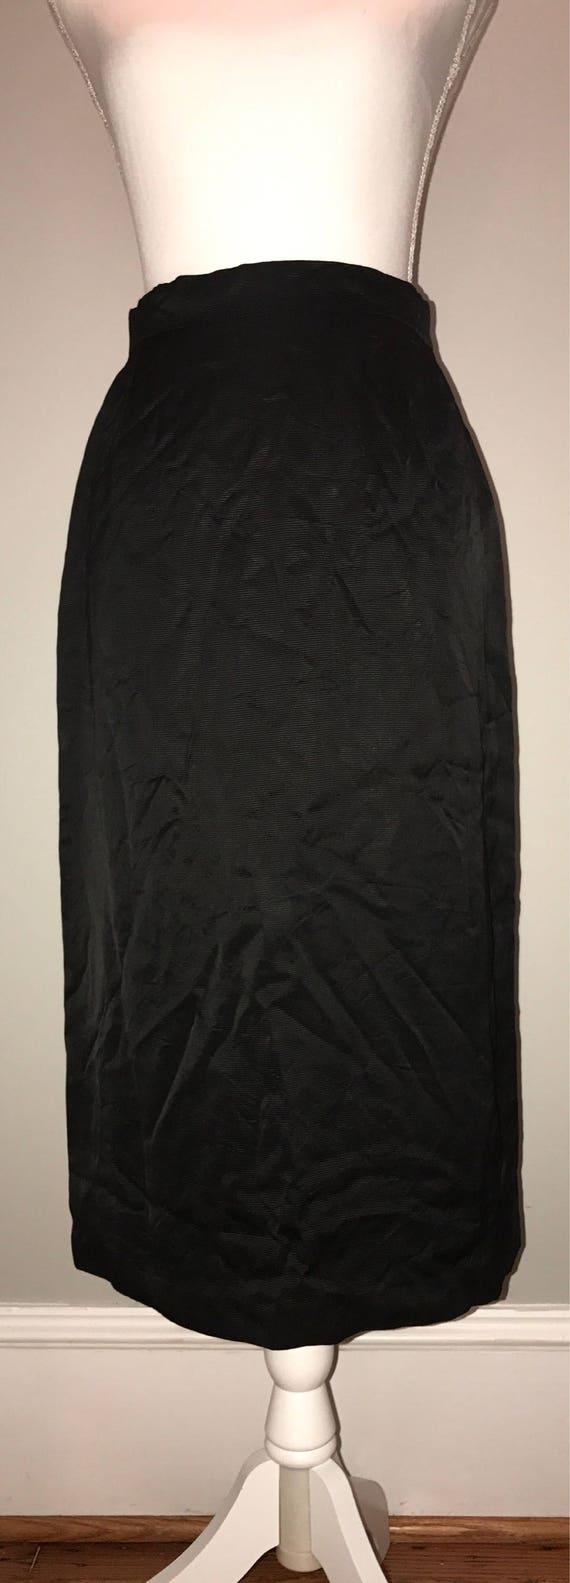 Vintage 80's Black Pencil Skirt / size 36 (US 6) /